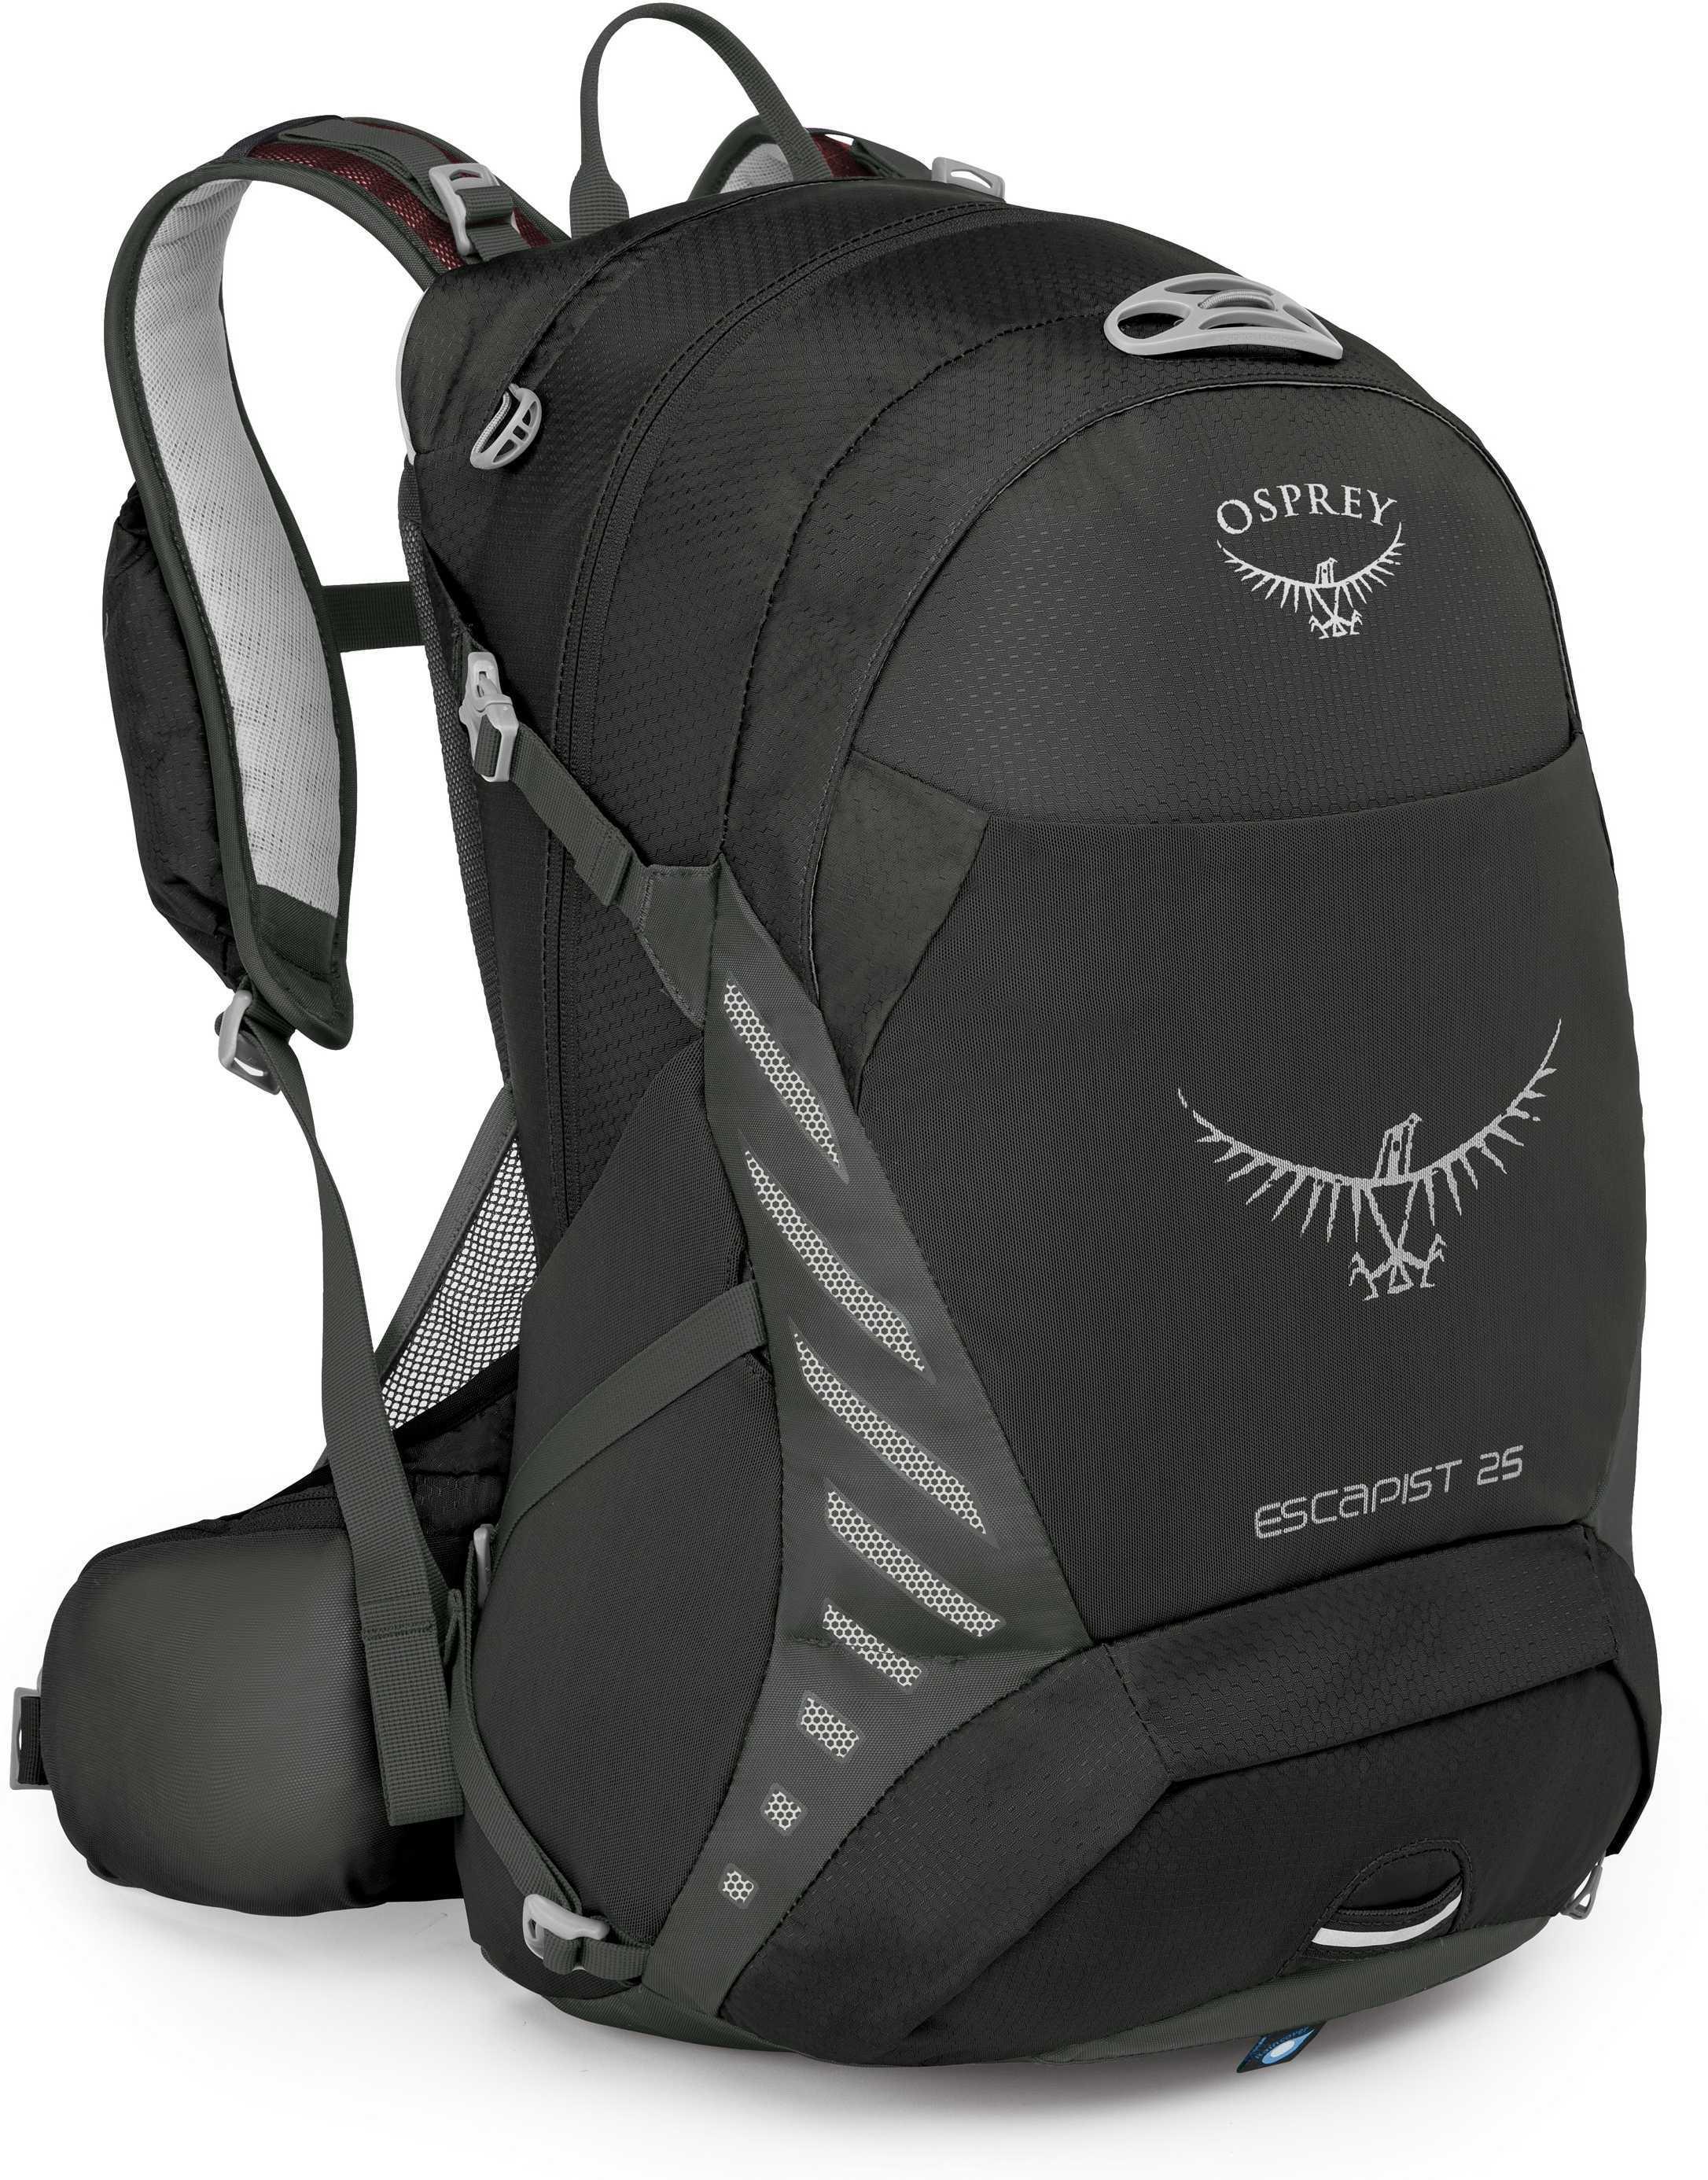 Ryggsäck Osprey Escapist 25 l small/medium svart